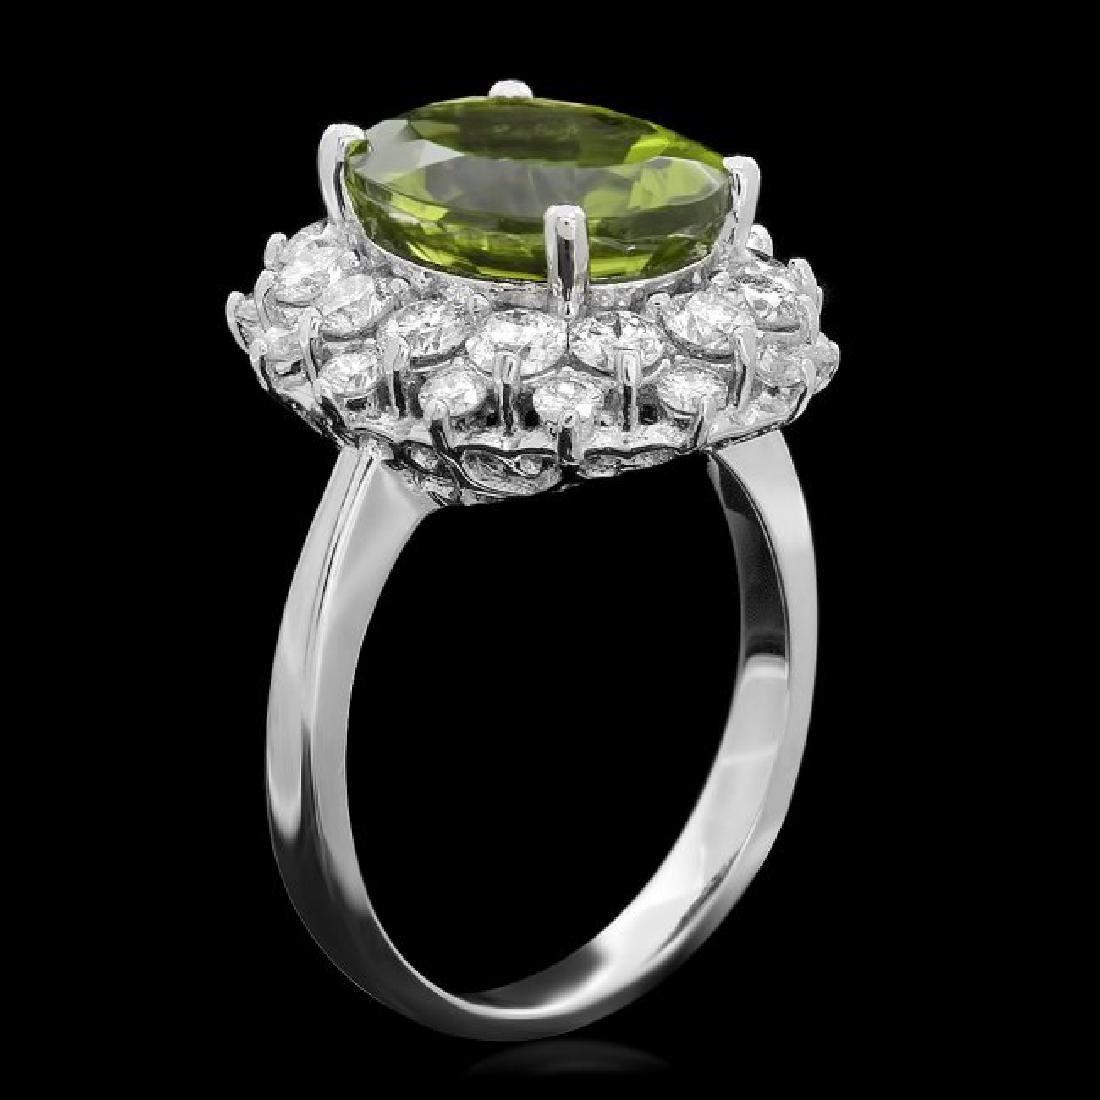 14k White Gold 5.00ct Peridot 1.60ct Diamond Ring - 2